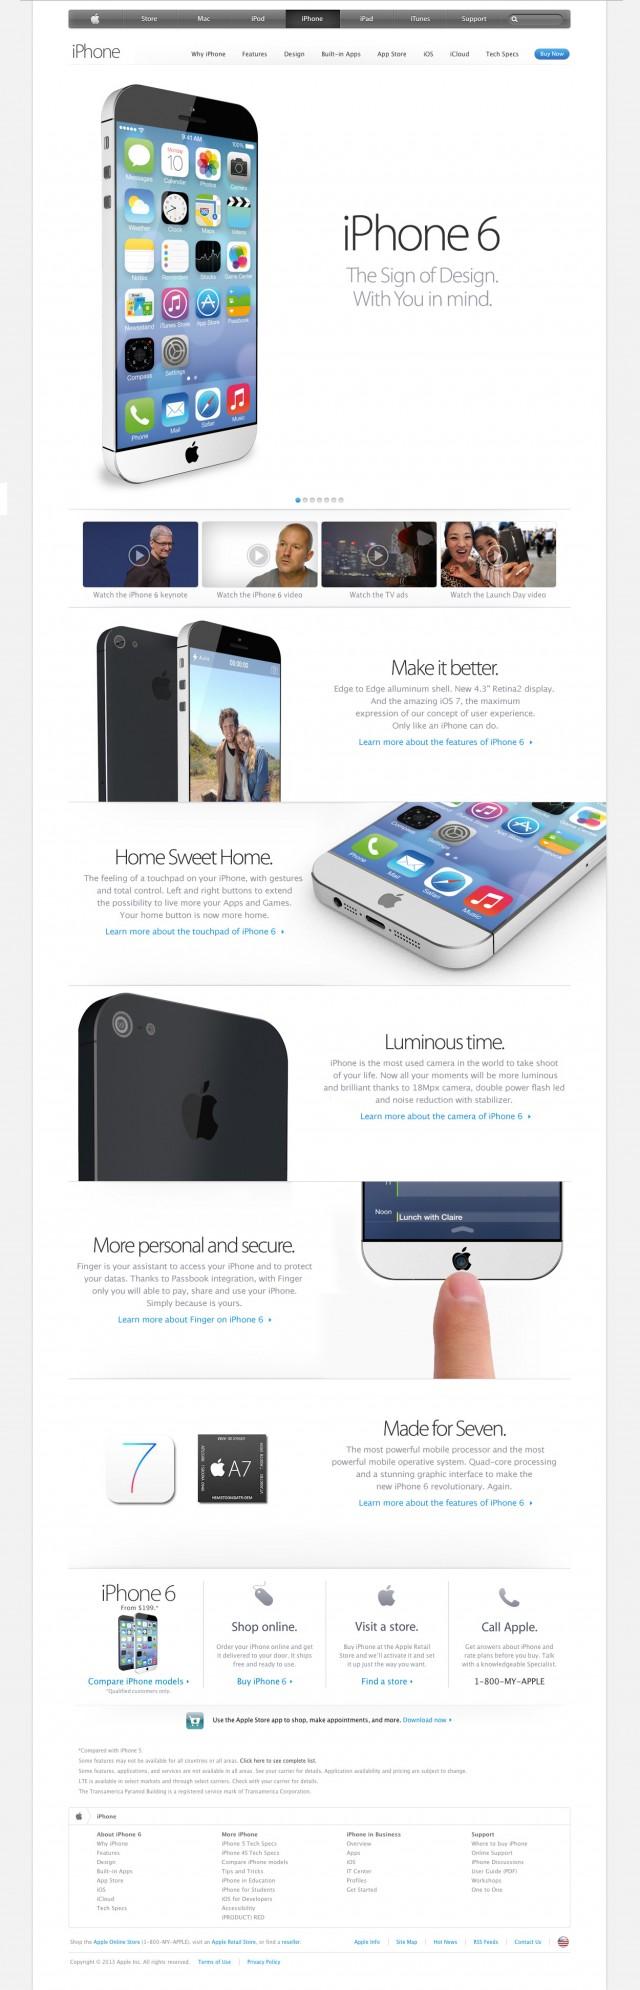 Концепт iPhone 6 на apple.com